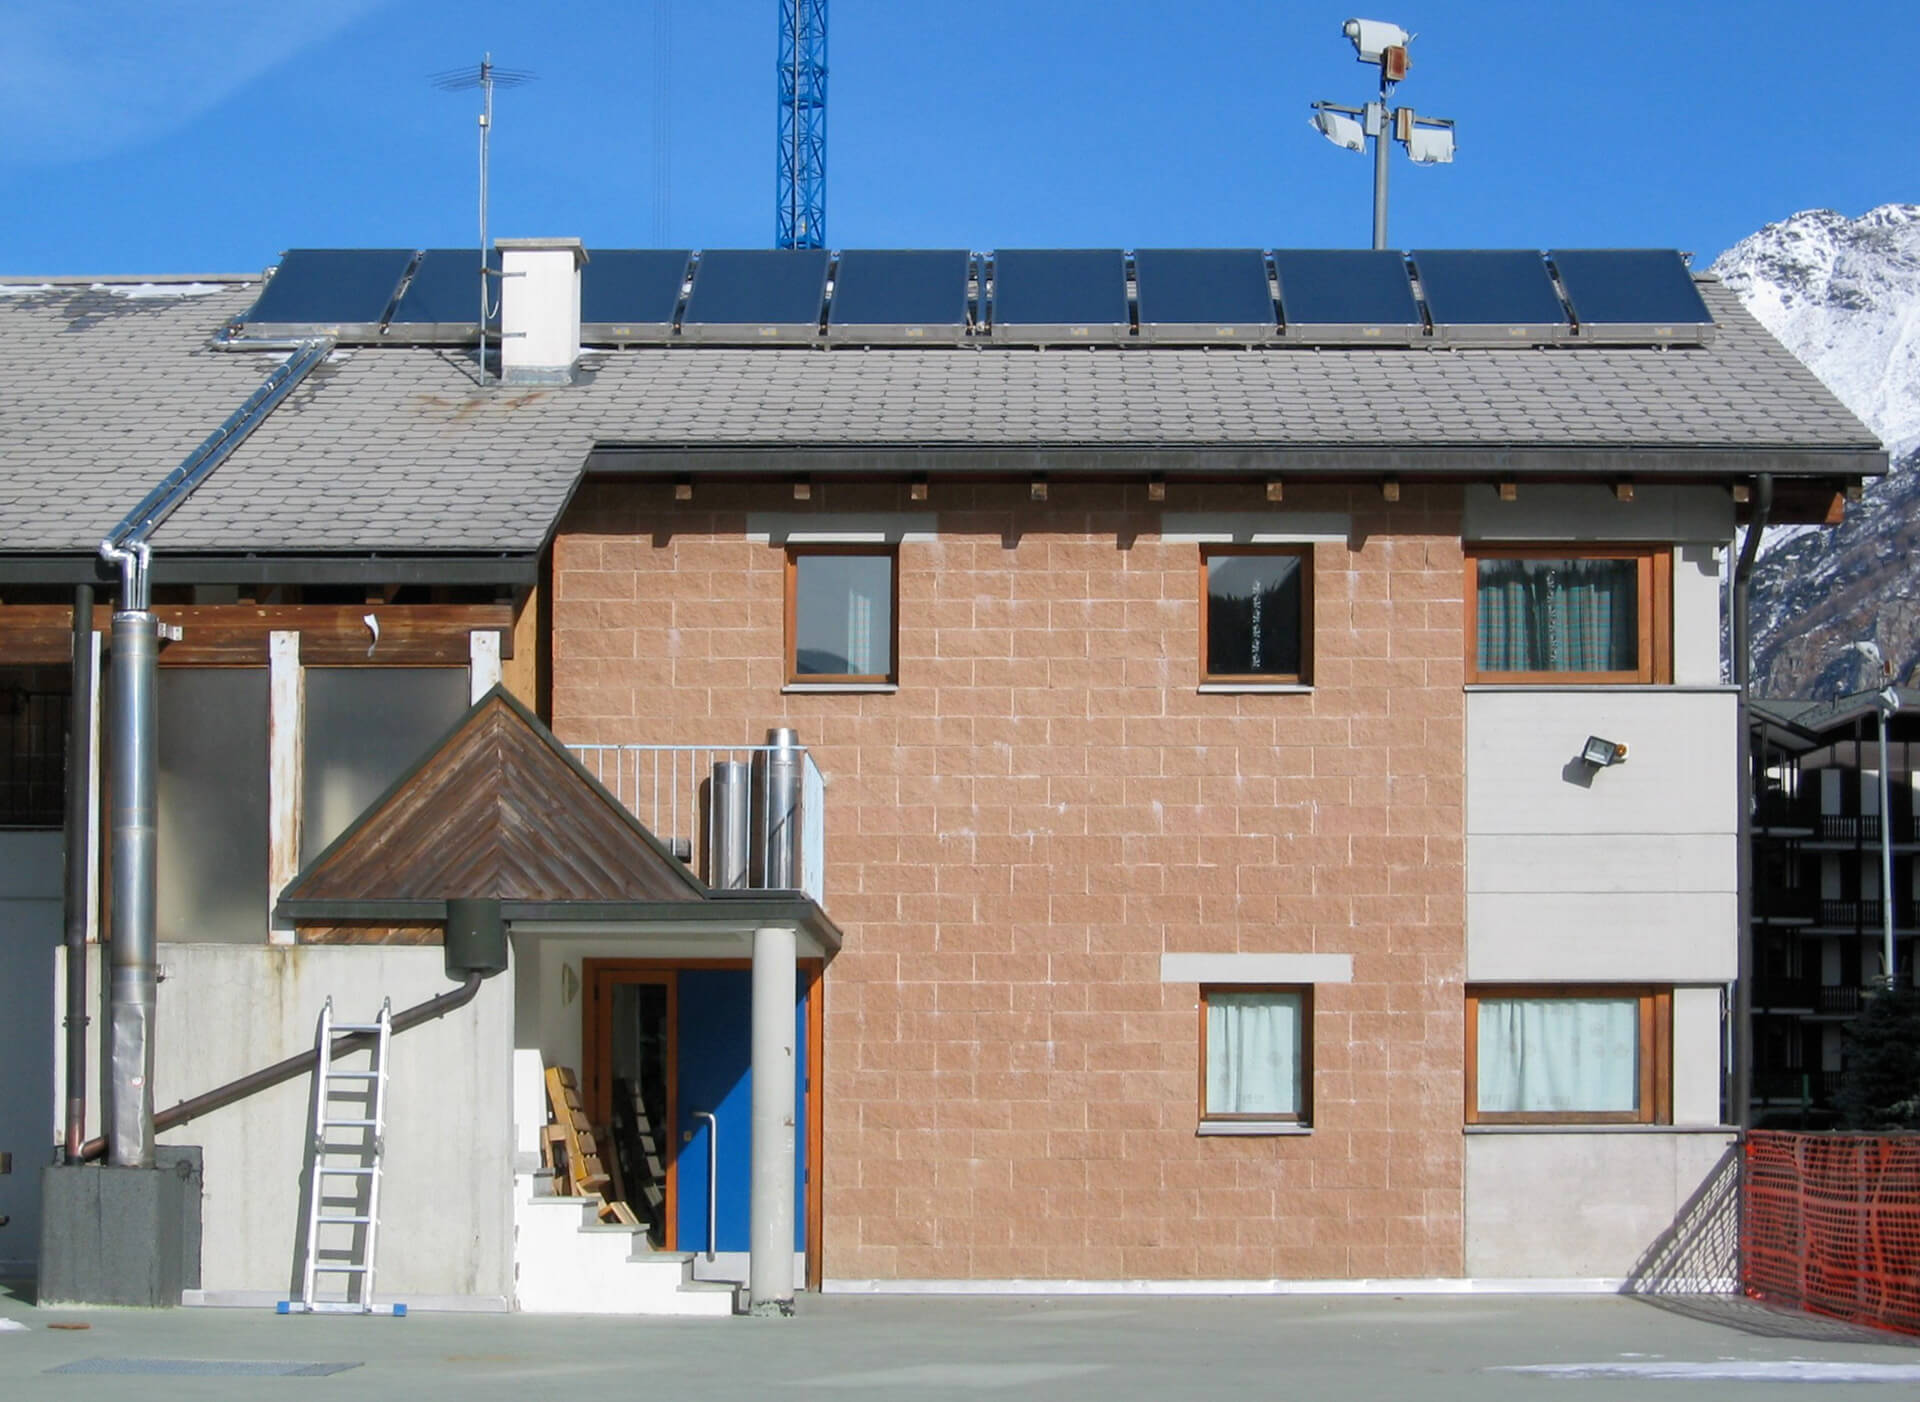 Simit Impianto Civile Fotovoltaico